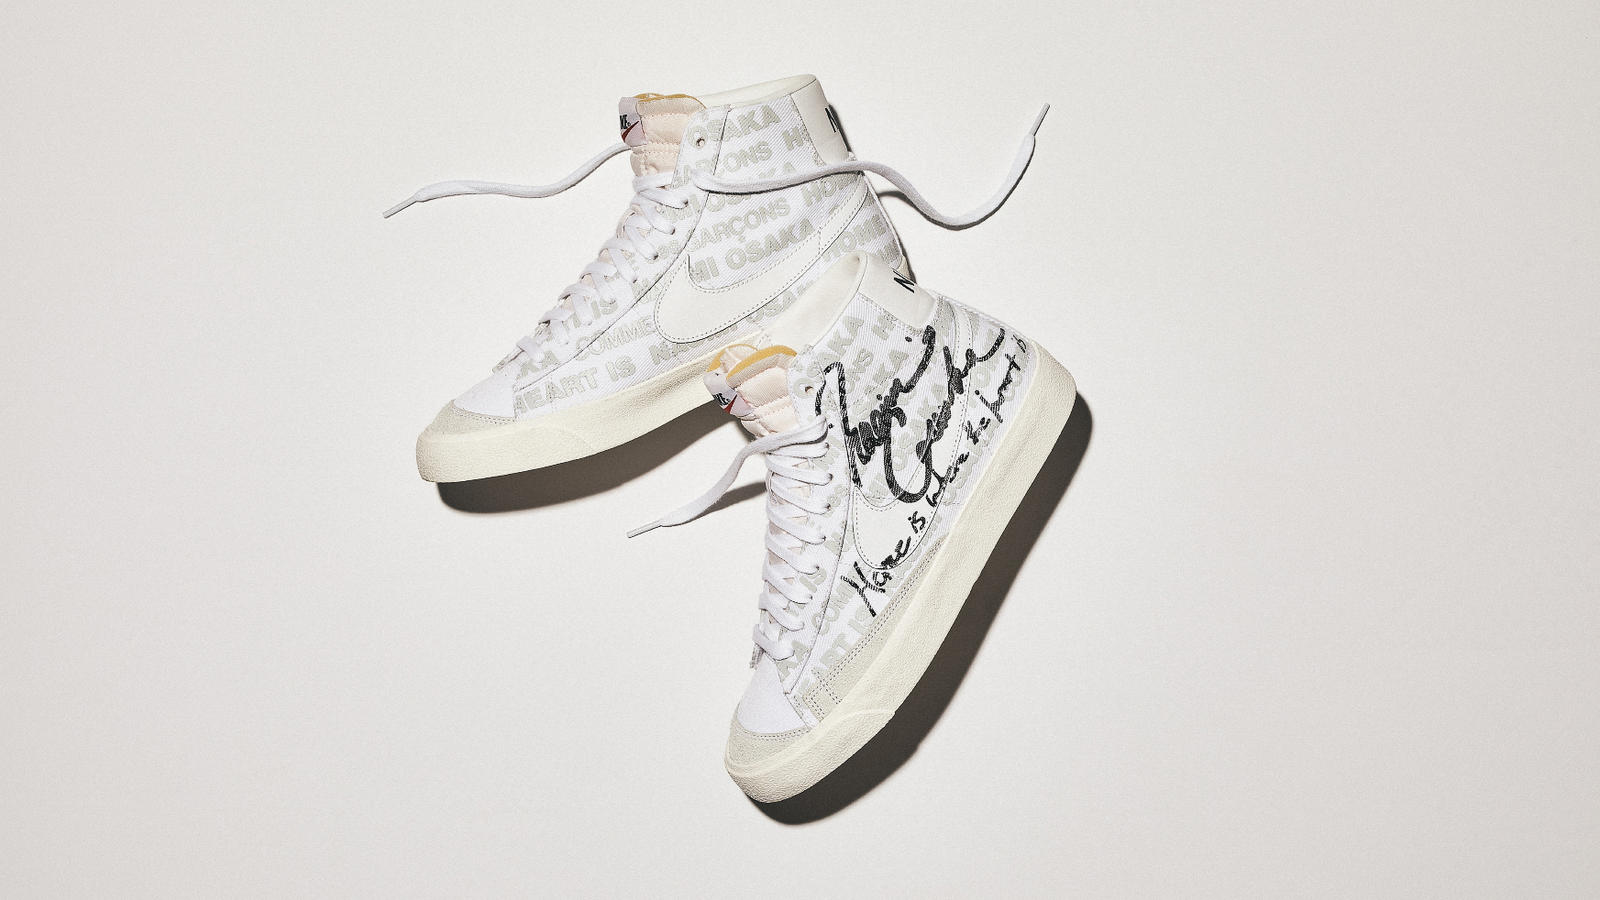 Nike x Naomi Osaka x CDG Blazer 0